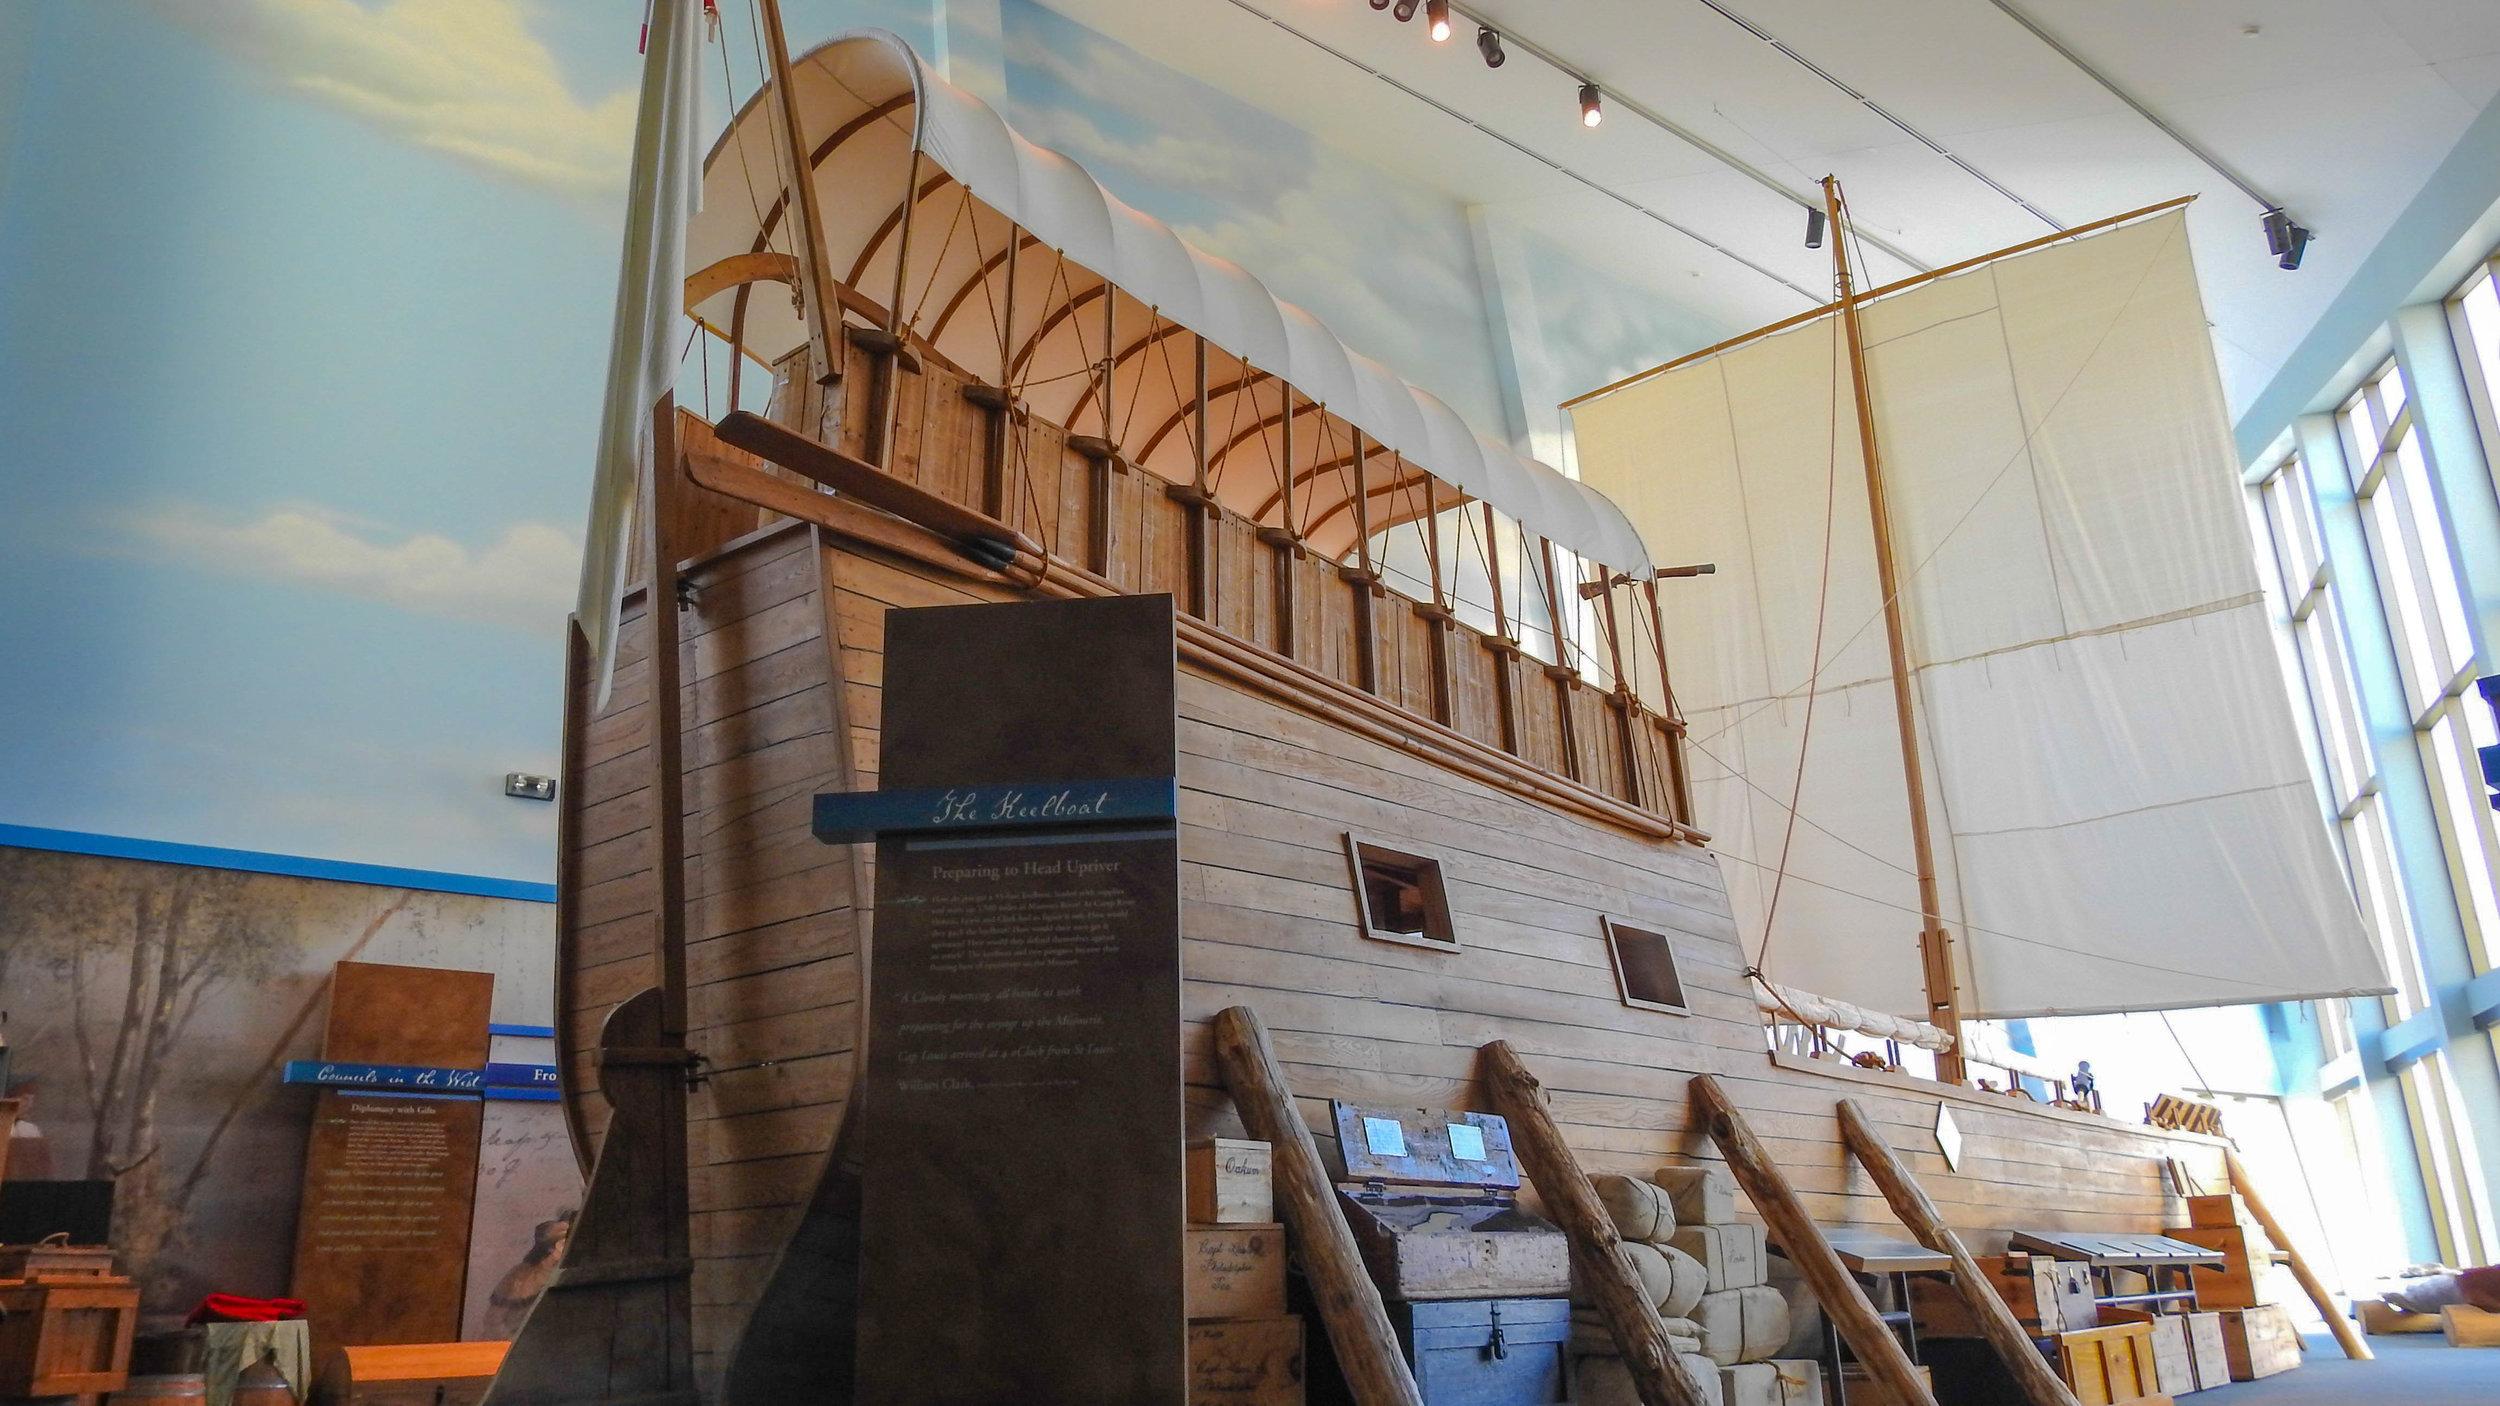 keelboat-01092019_alr-3319.jpg